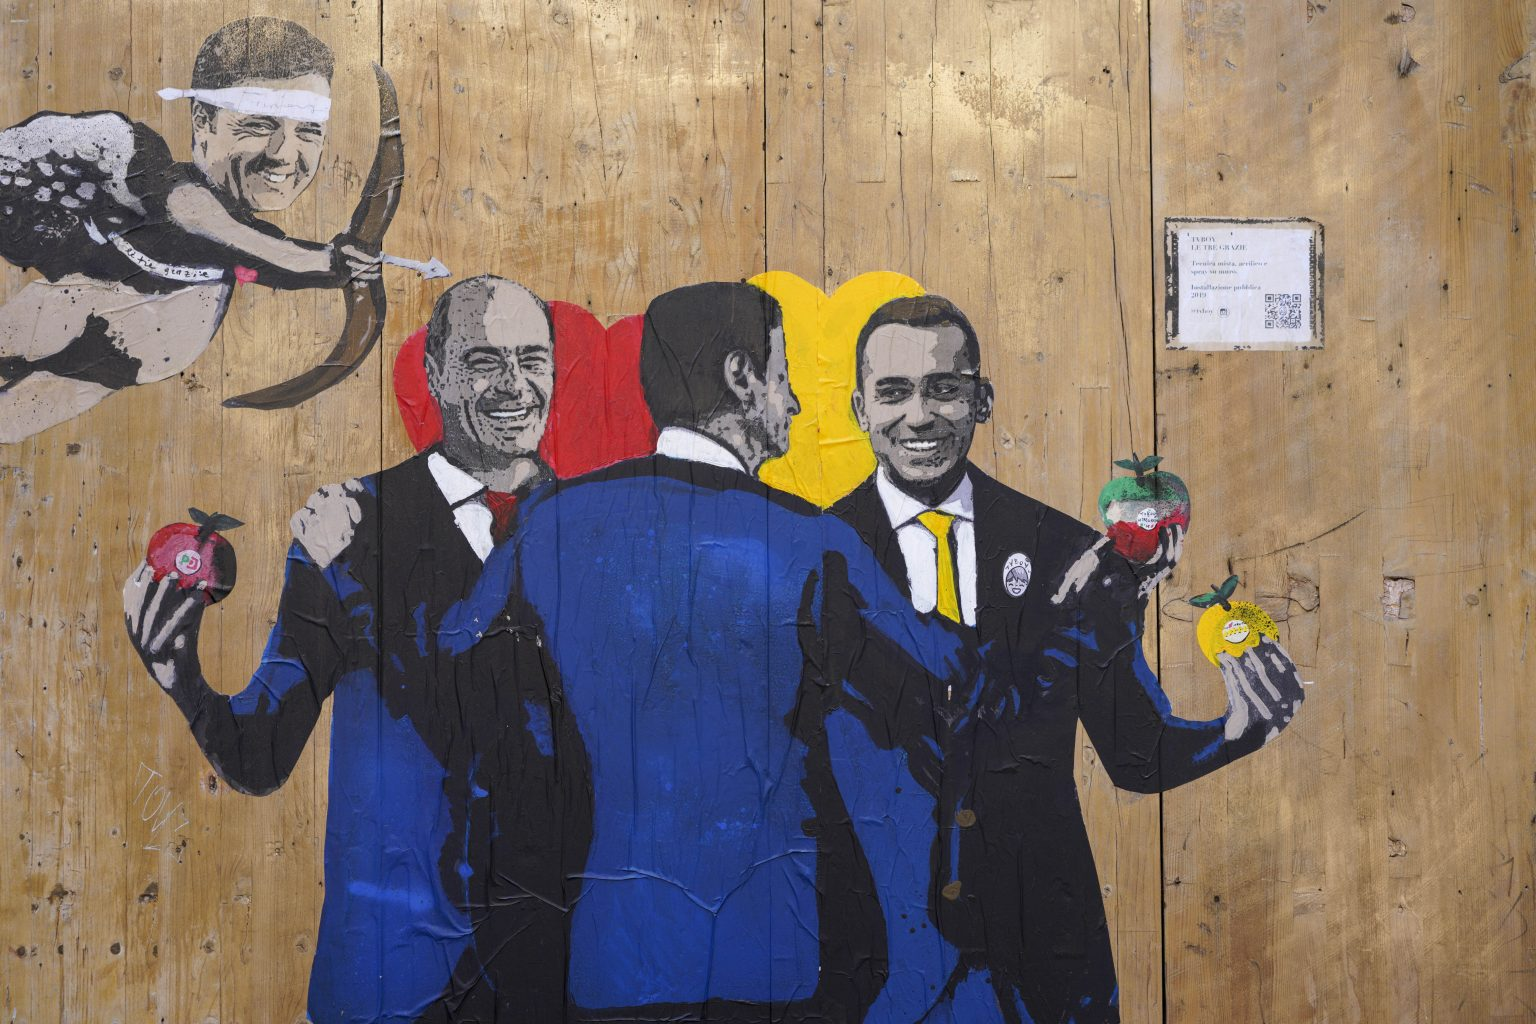 Italy,populism